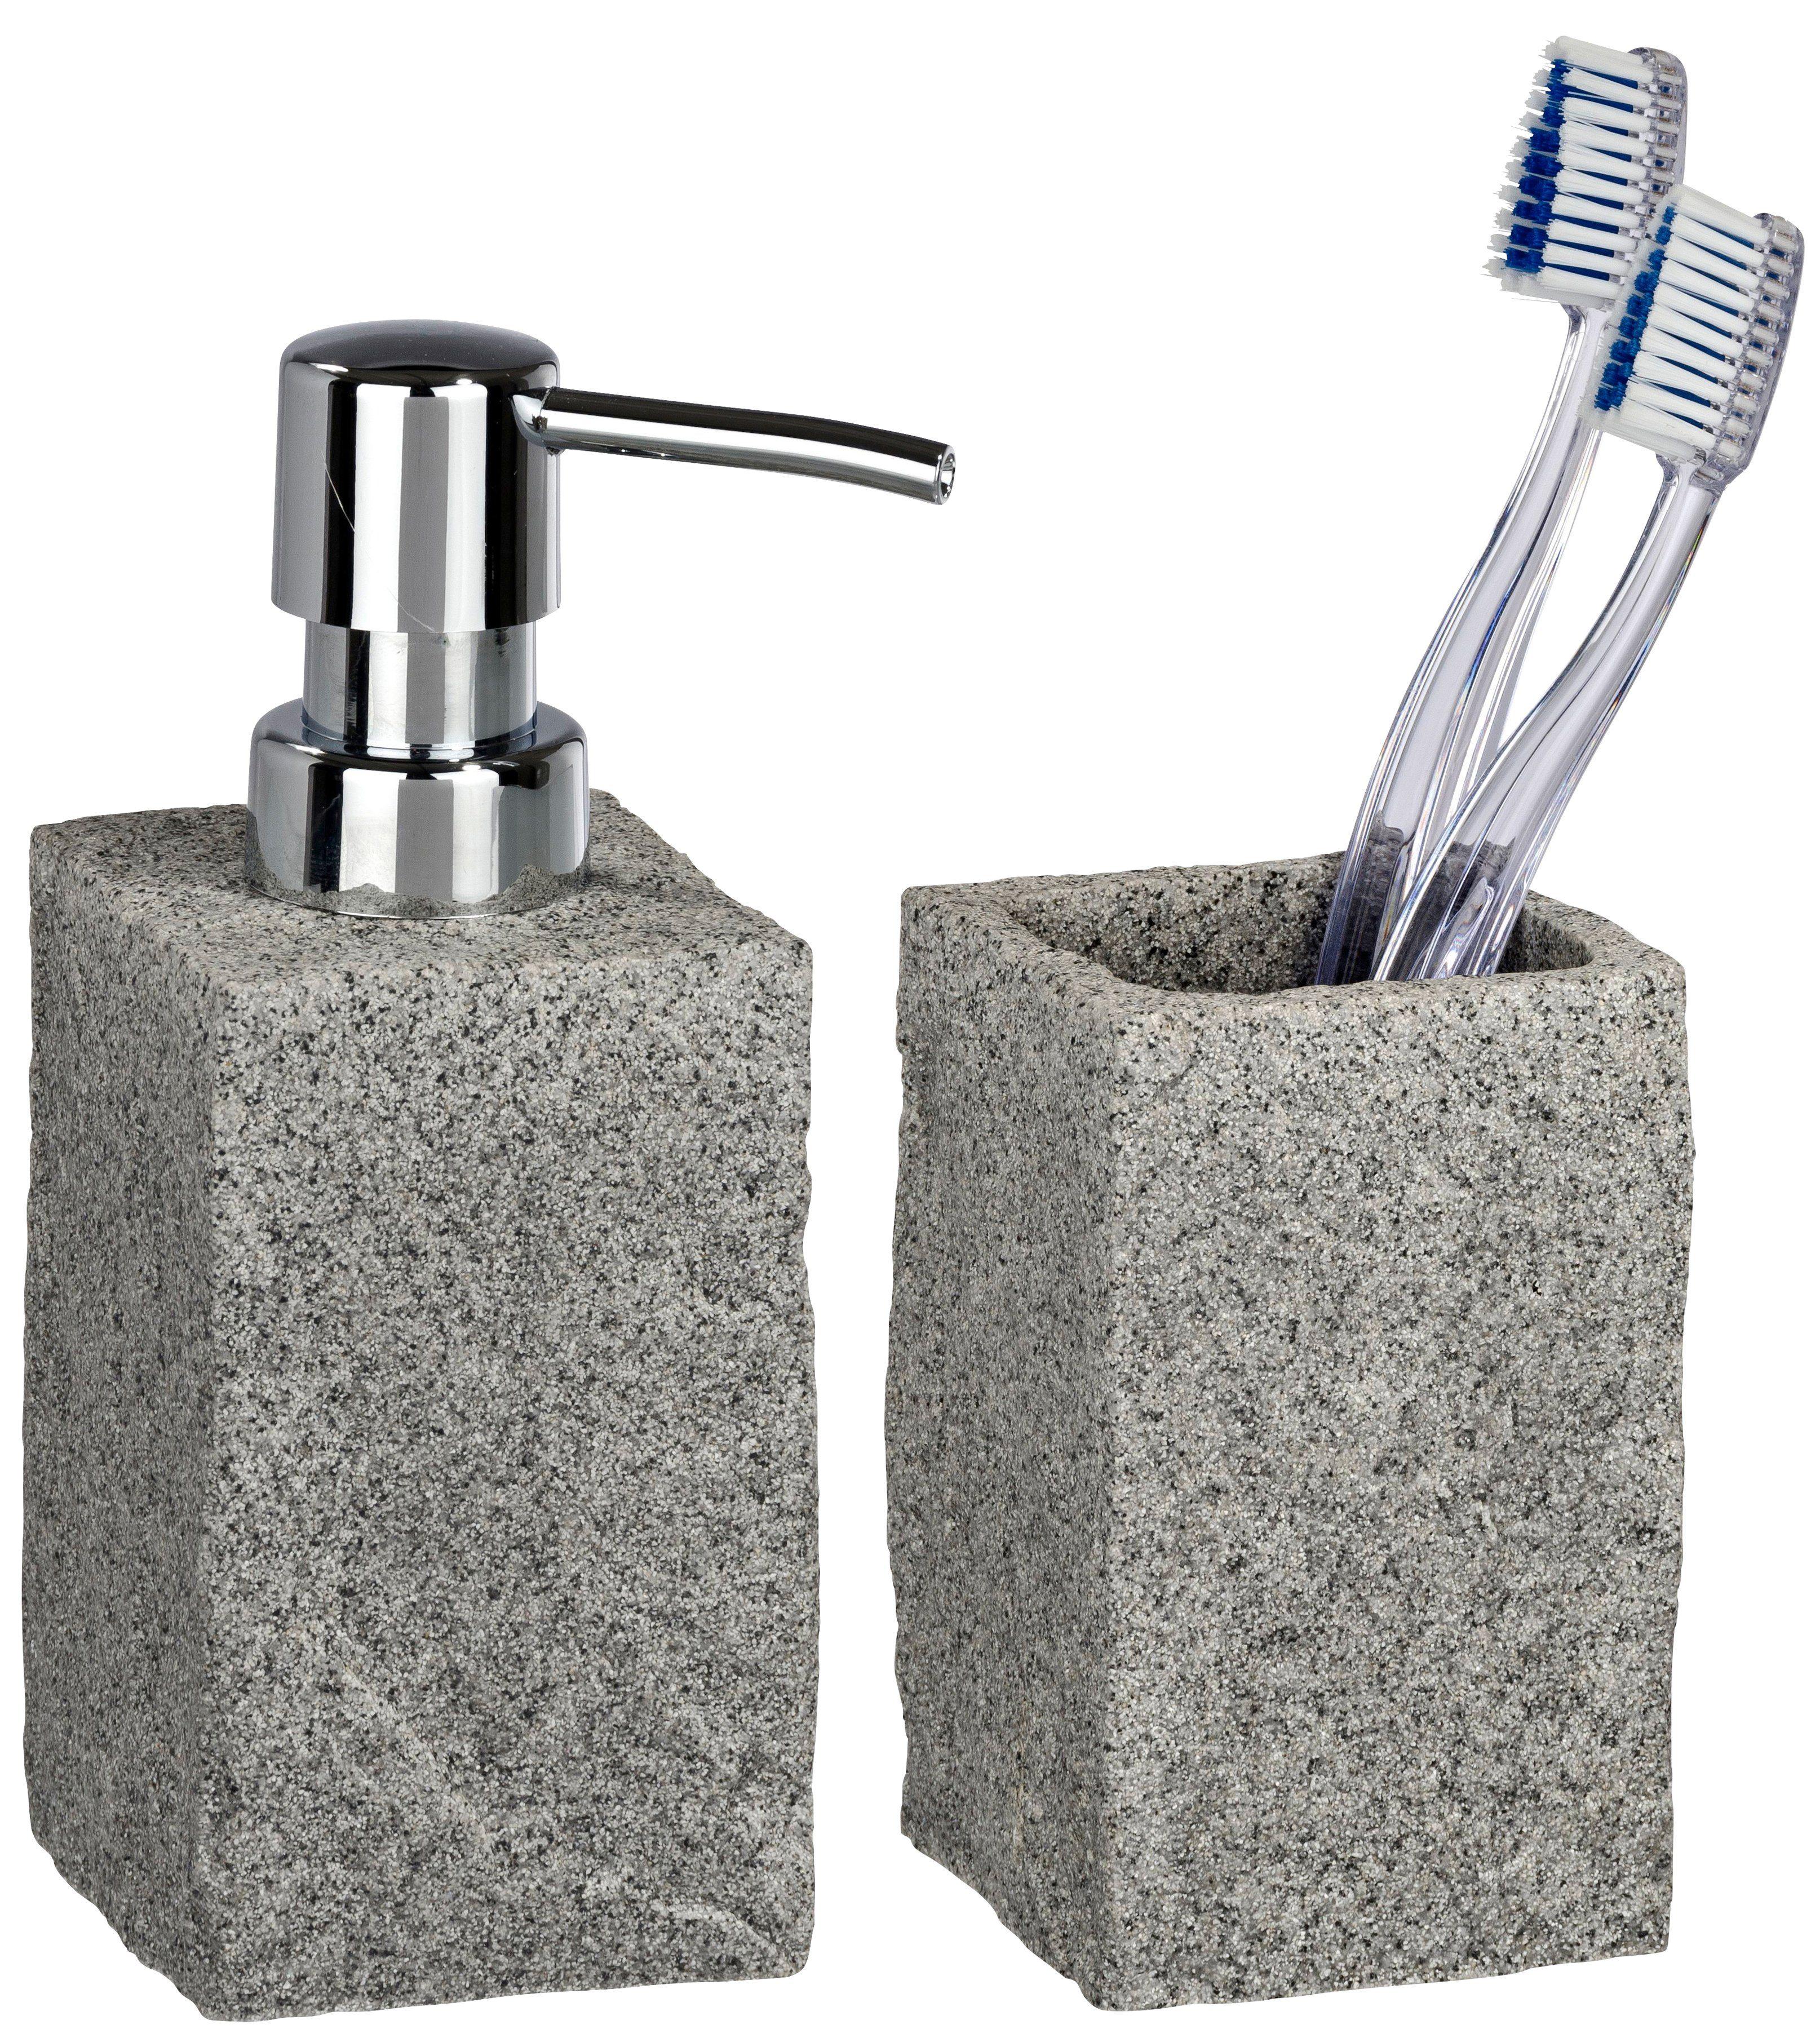 Bad-Accessoire-Set »Granit«, 2-teilig